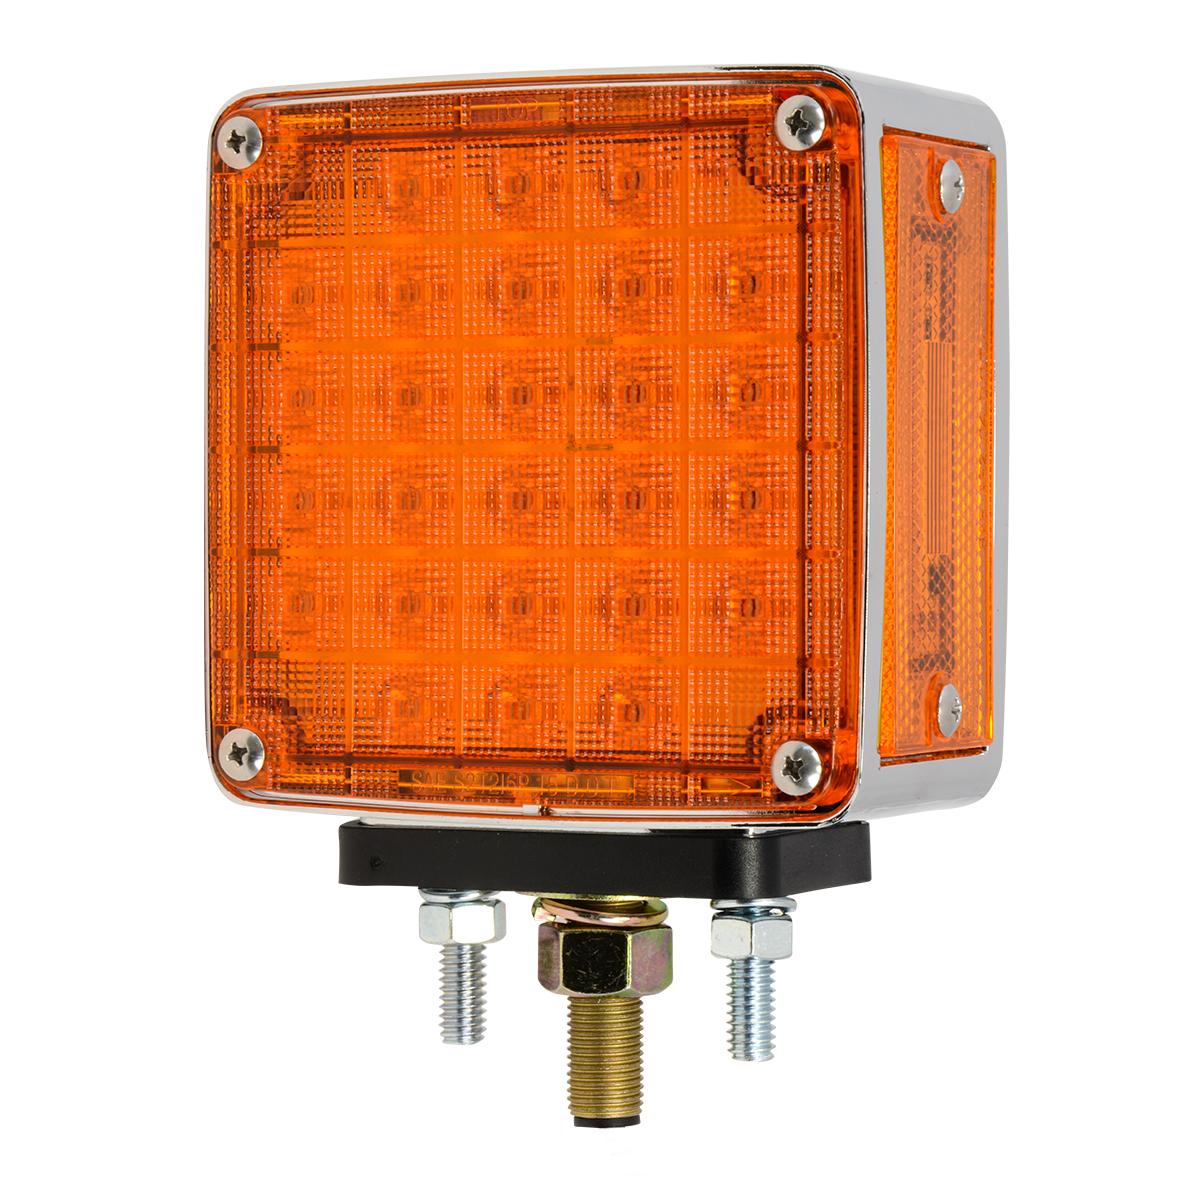 Square Double Face Smart Dynamic LED Pedestal Light in Color Lens